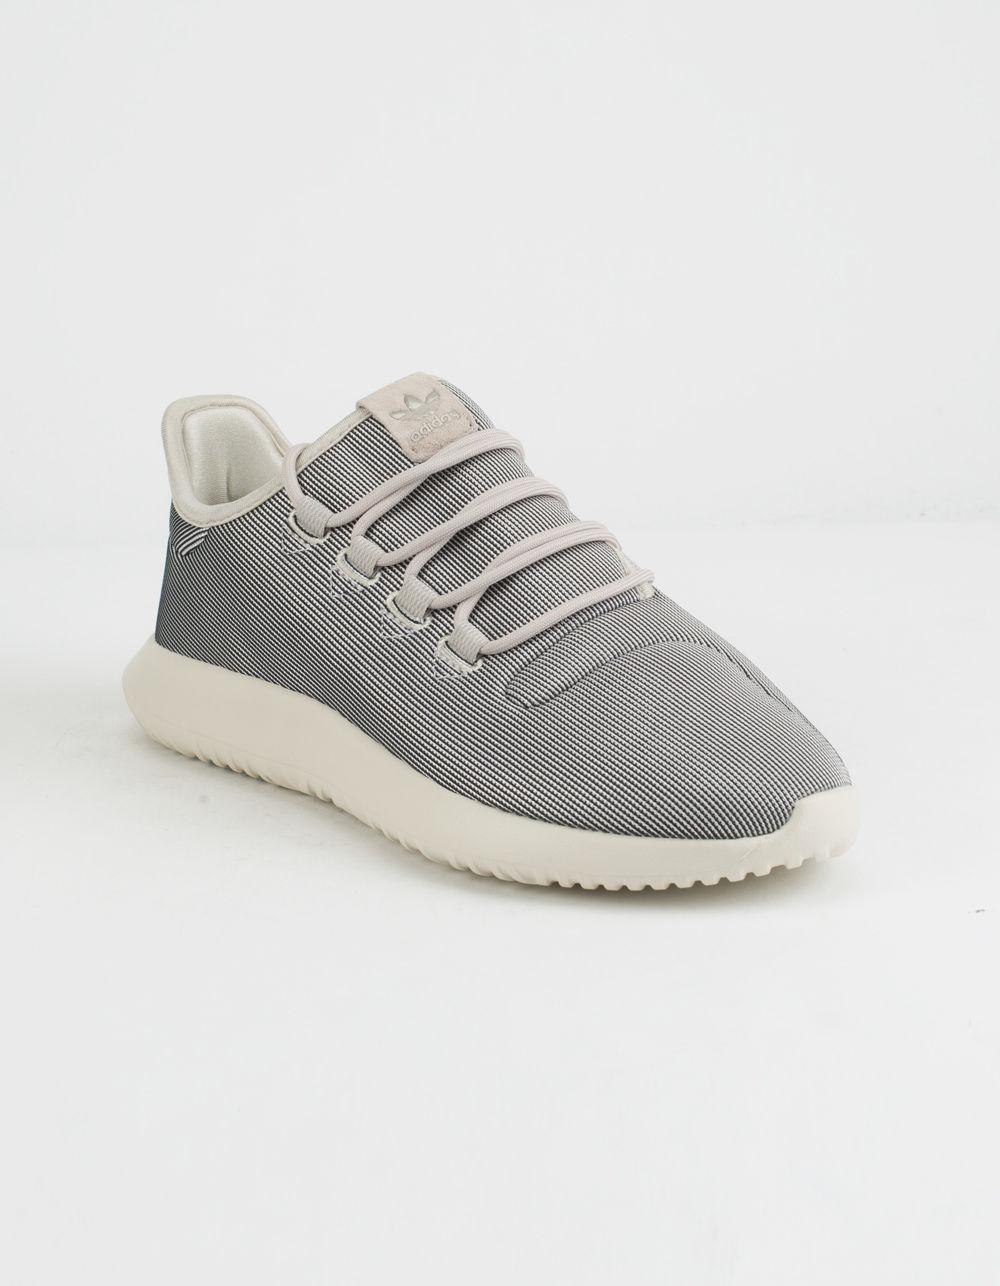 usa green silver womens adidas tubular shadow shoes 9a16b 459b2